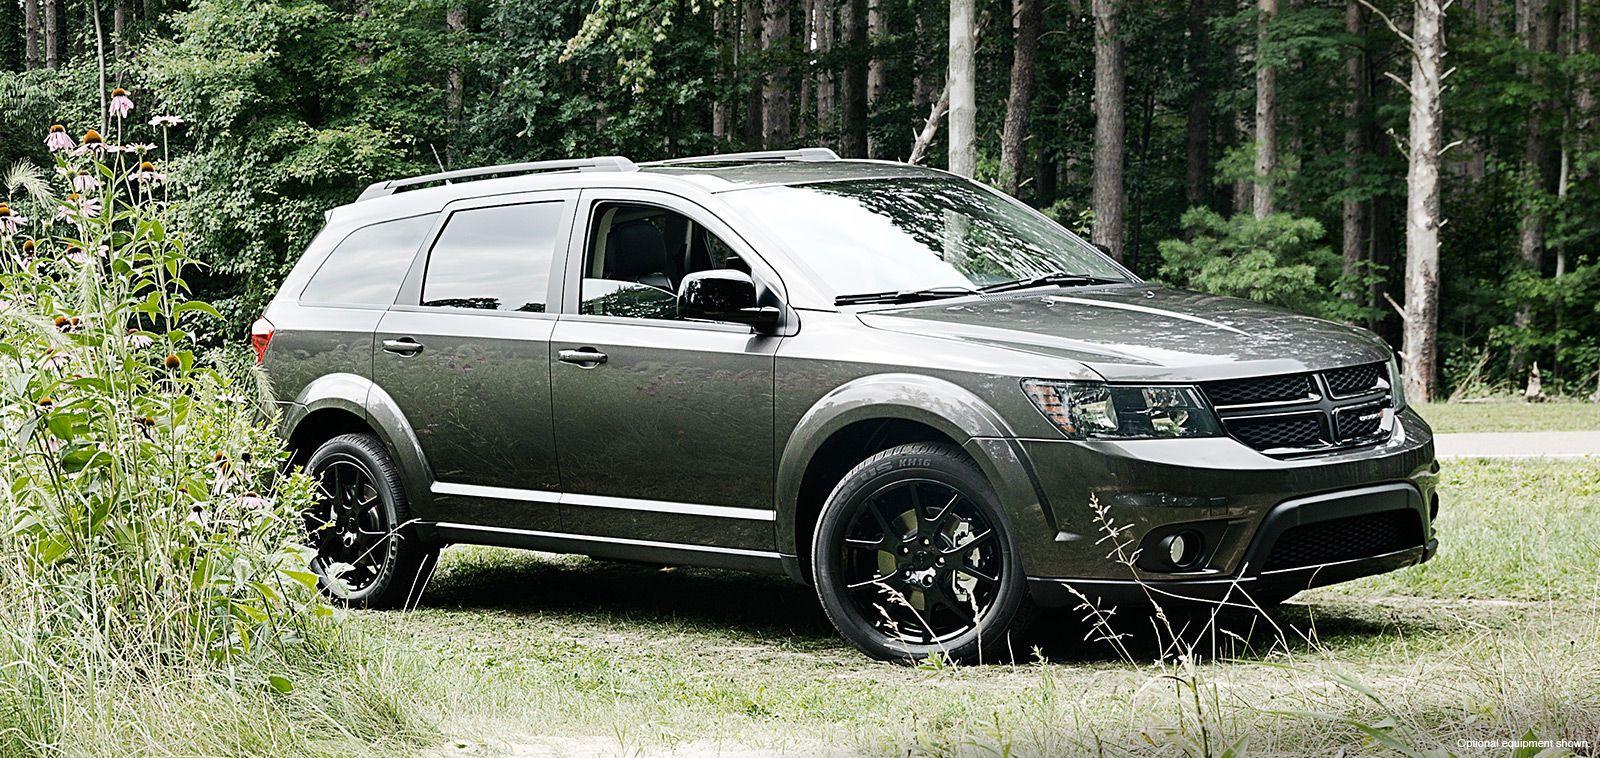 Affordable Midsize Crossover 2016 Dodge Journey Dodge Journey Crossover Suv